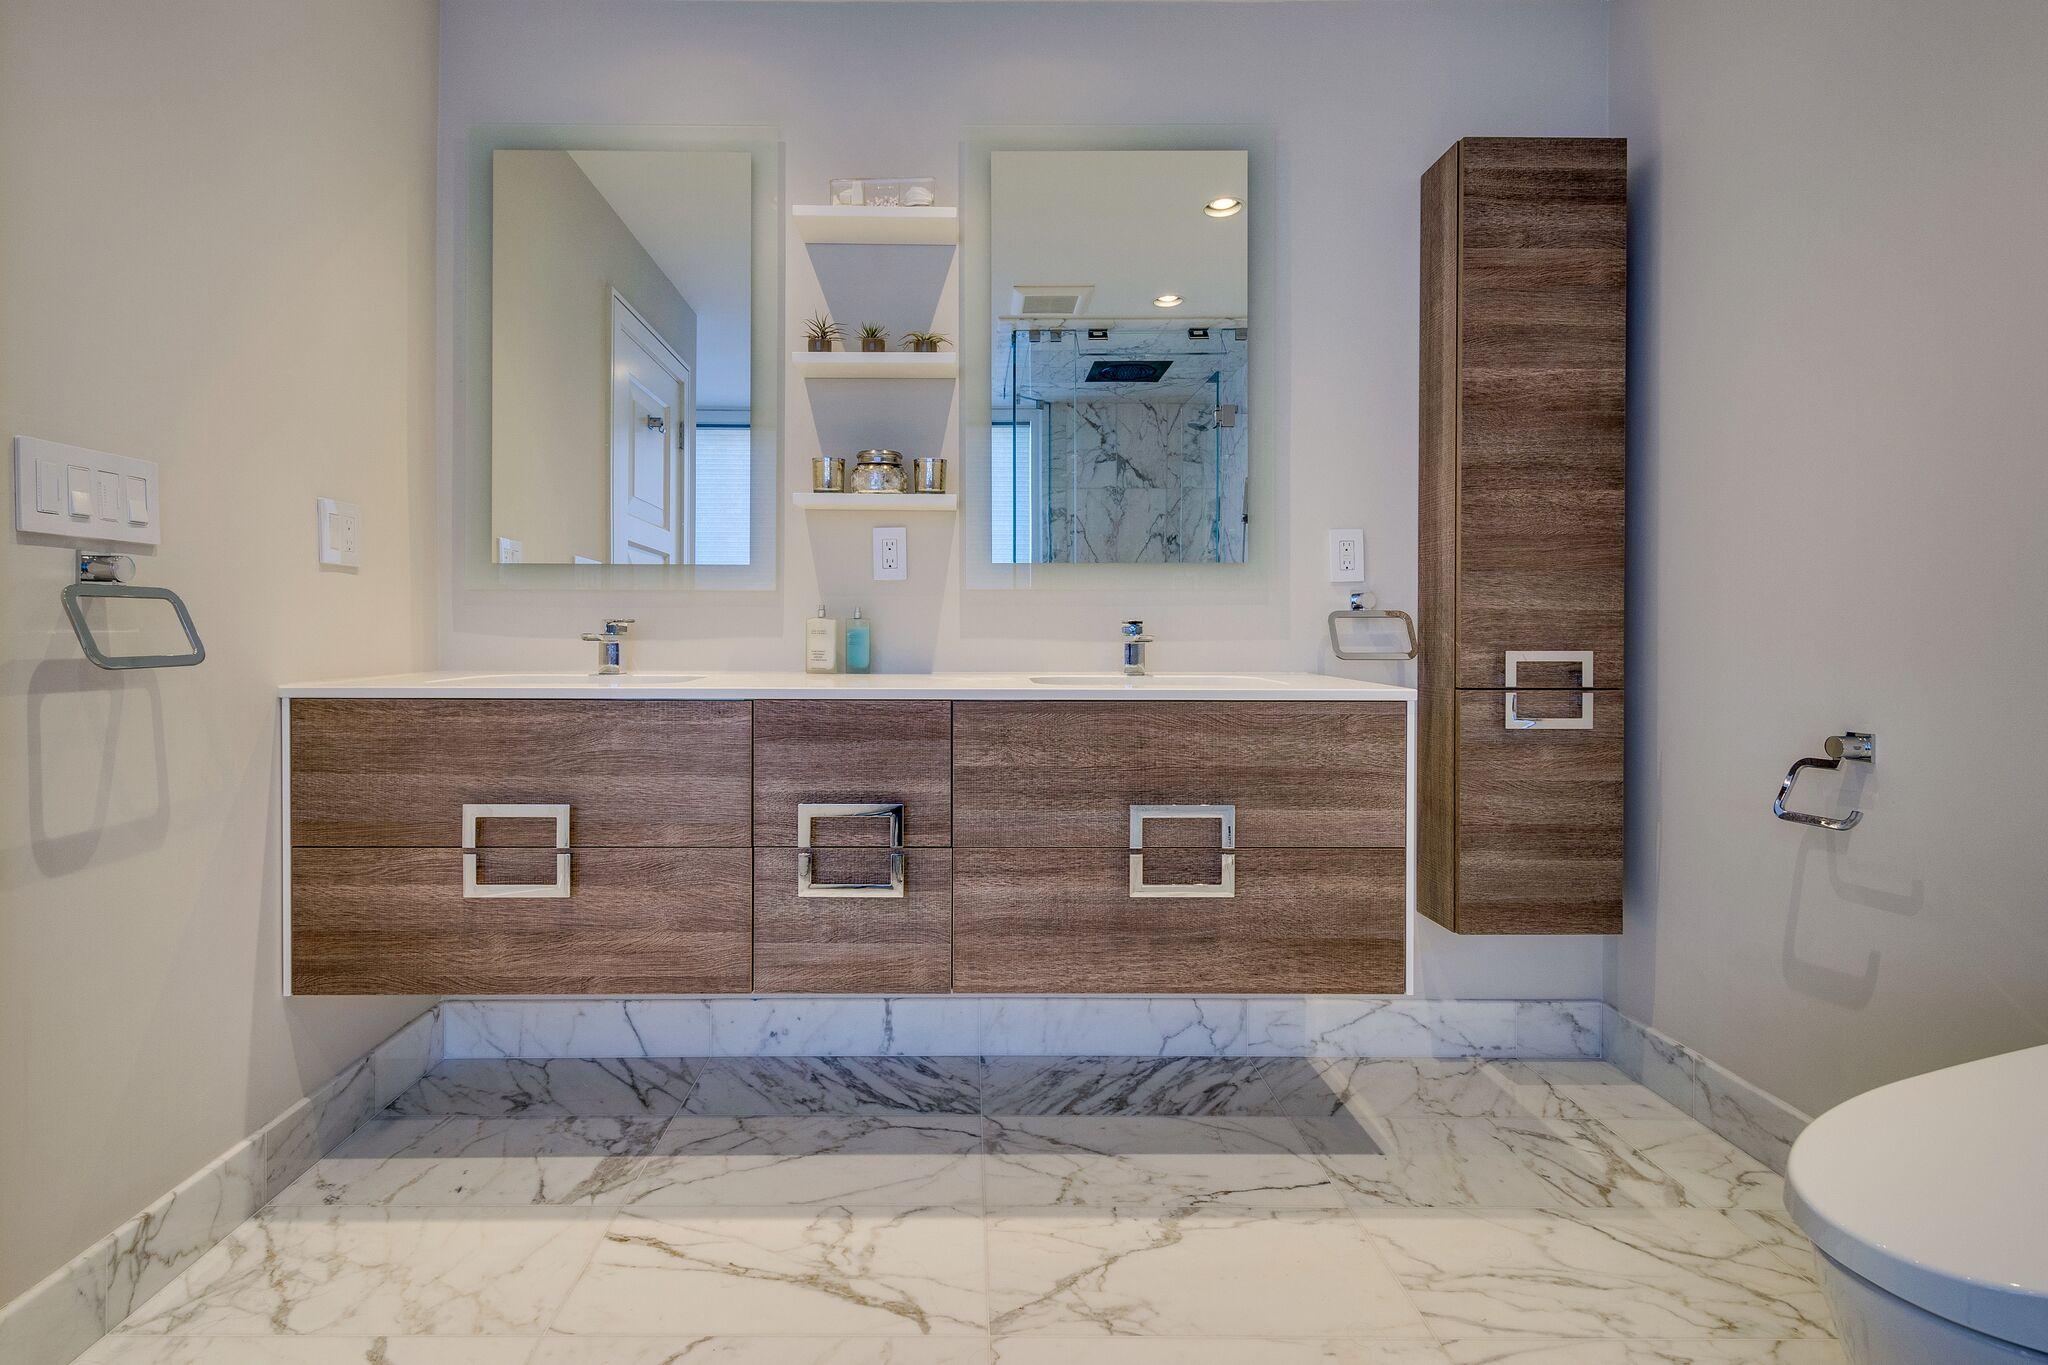 Wood Cabinets in a Modern Bathroom